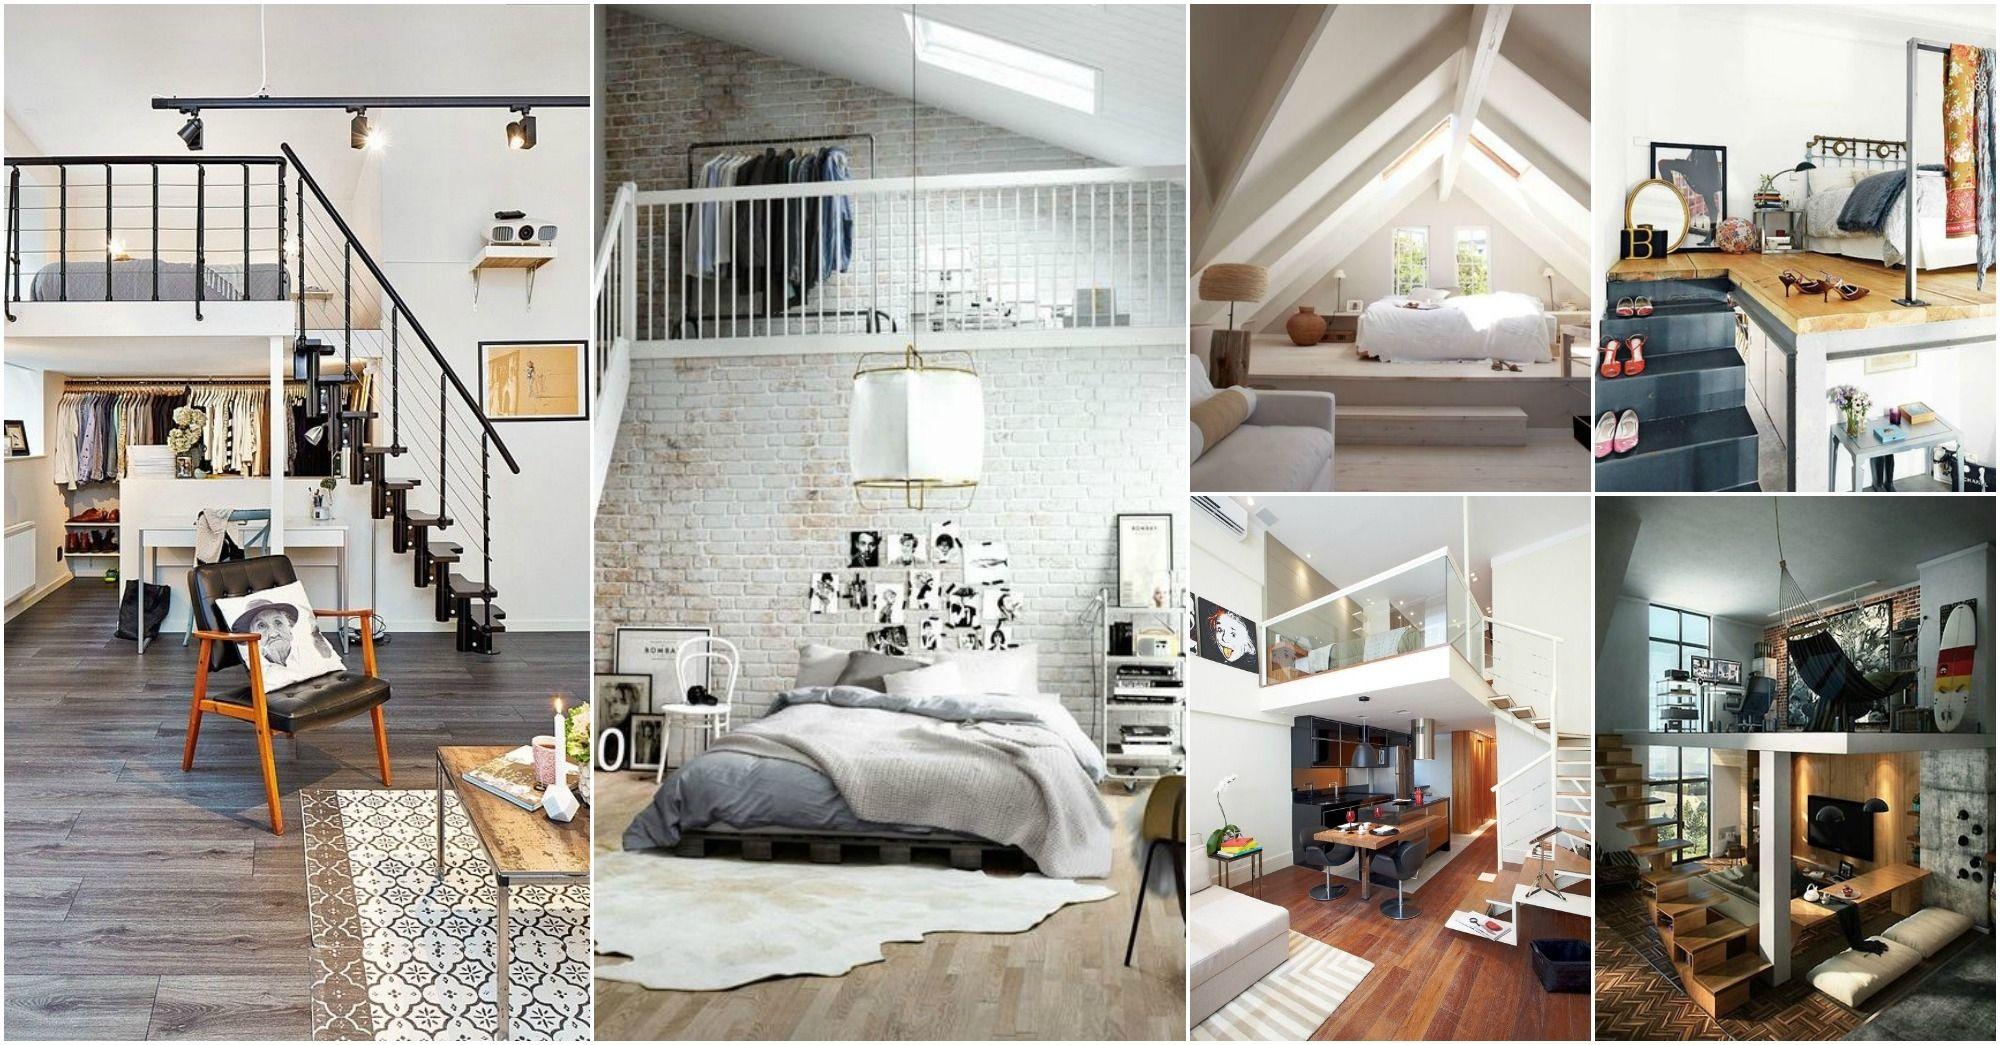 Loft Apartment Bedroom Ideas Loft Bedroom Decor College